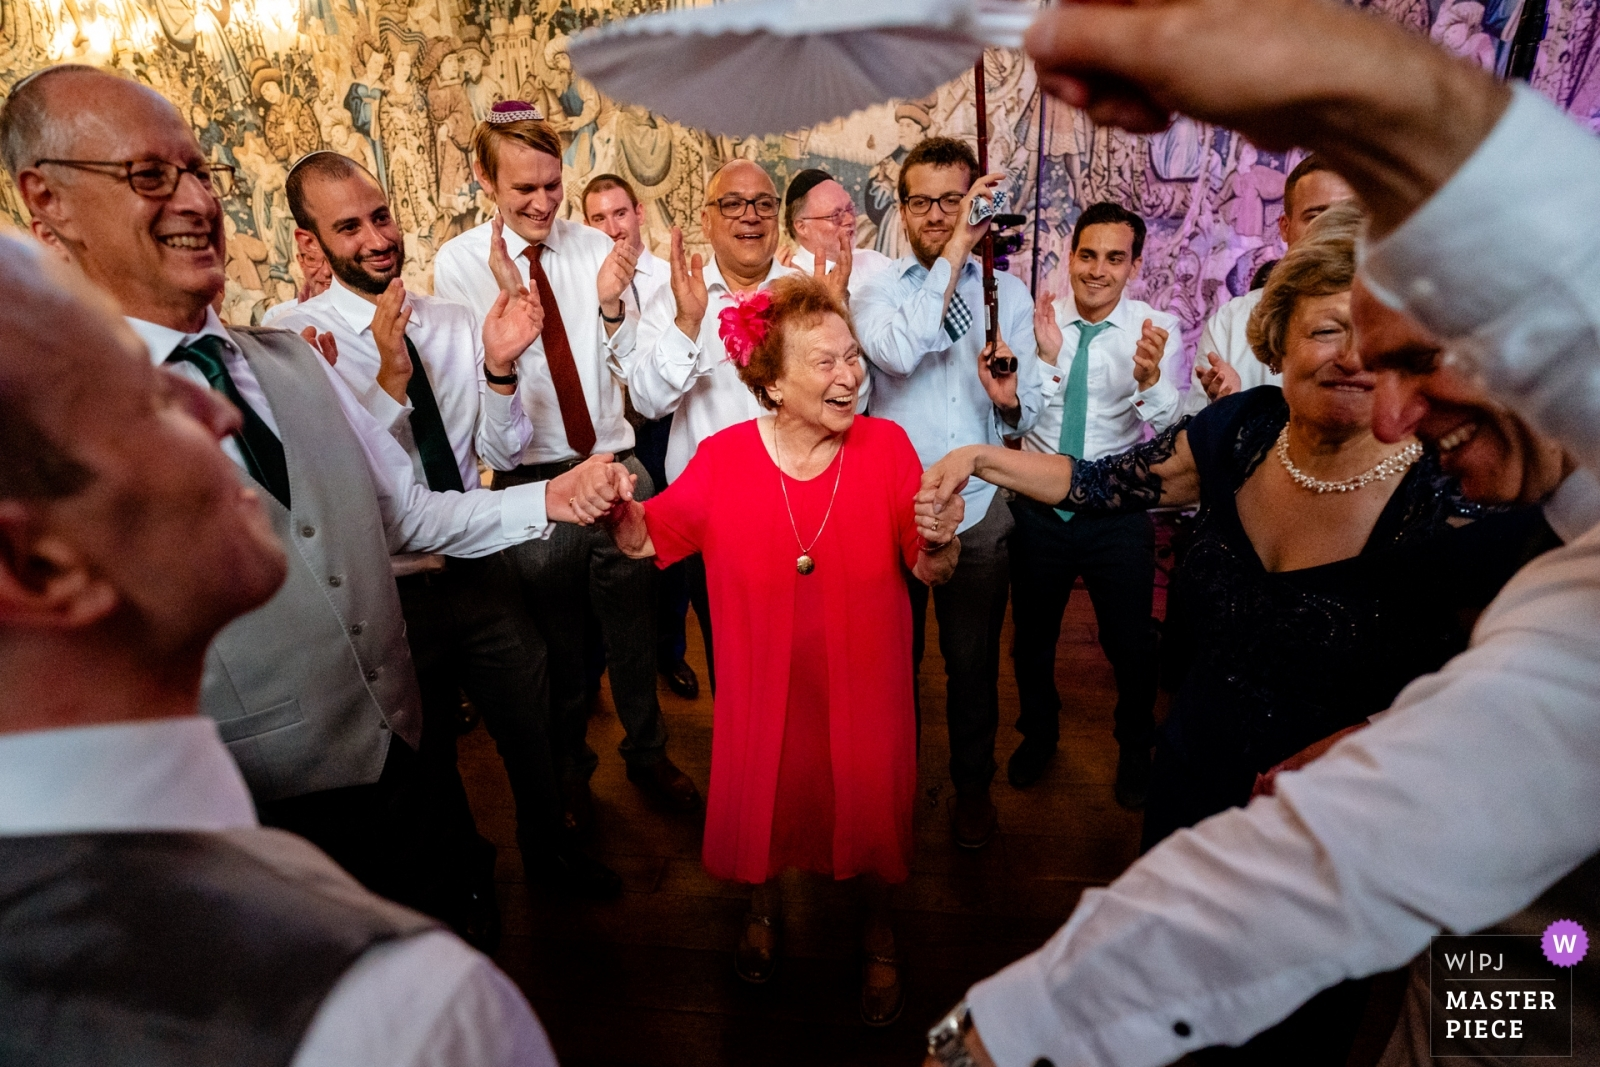 Grandma on the dance floor - Hertfordshire, England Wedding Photography -  | Hatfield House, Hertfordshire, UK